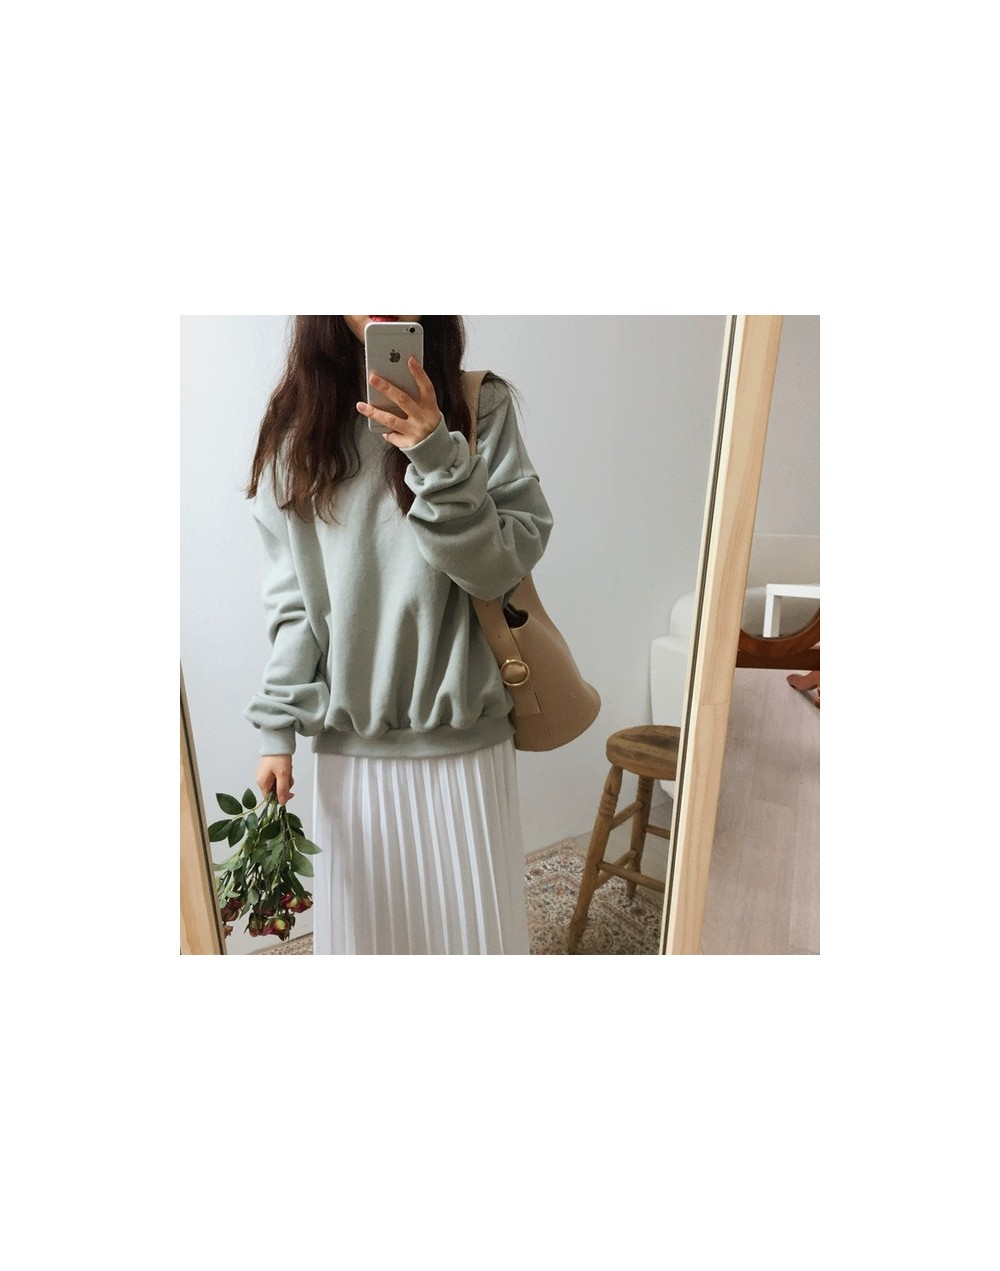 New Women Spring Autumn Sweatshirts Cotton Solid Long Sleeve O-Neck Loose Women Sweatshirt Casual Tops Outwear - Light Green...